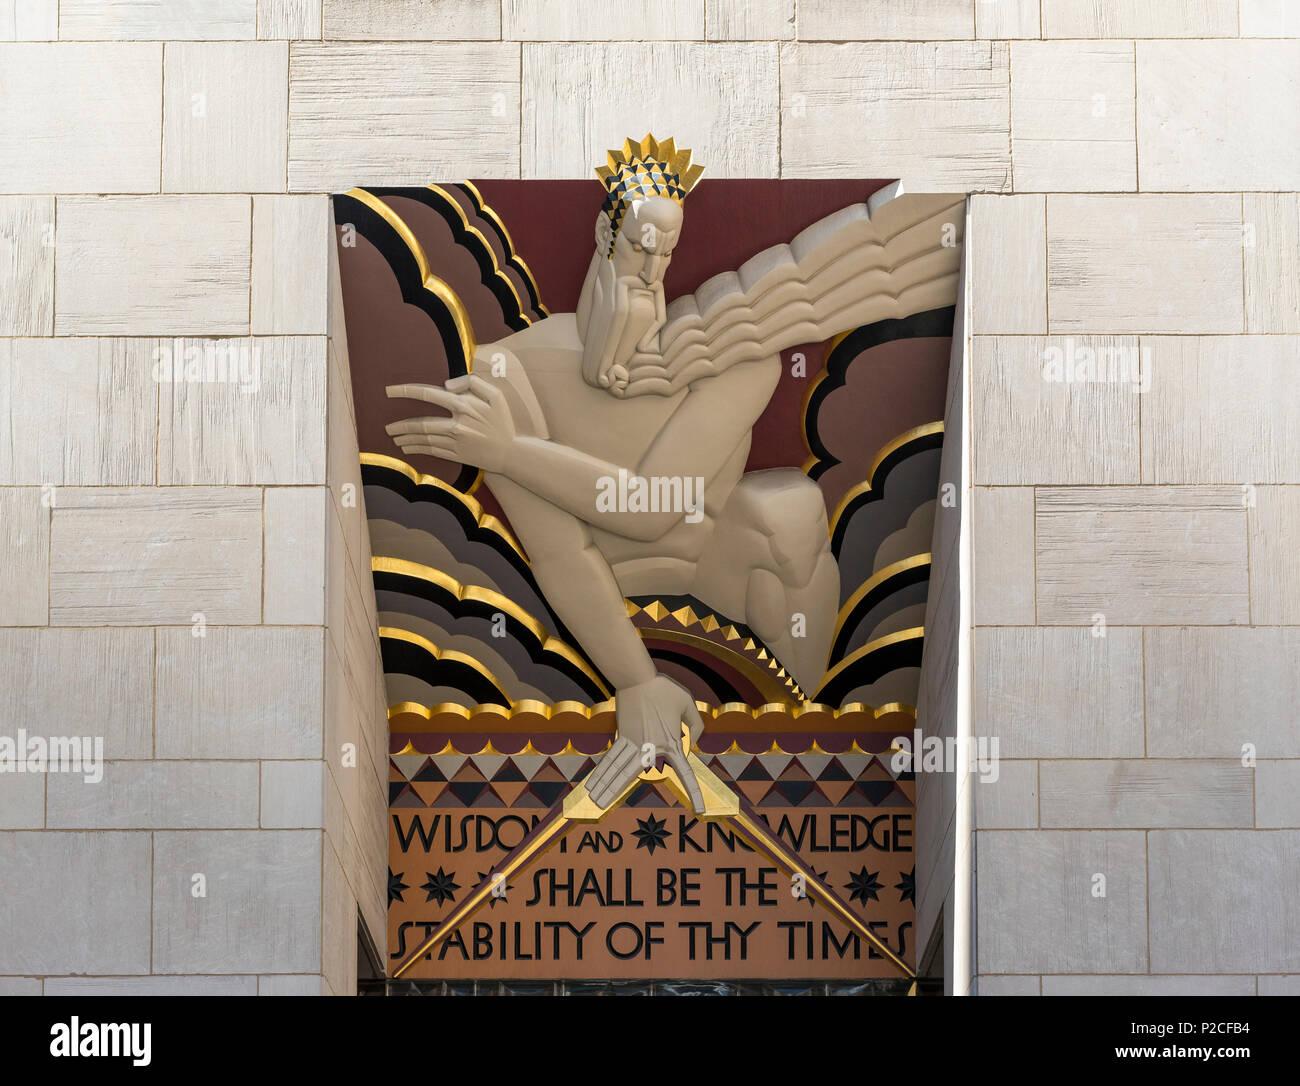 Art Deco sculpture Wisdom and Knowledge at entrance to 30 Rockefeller Plaza (Comcast Building), Rockefeller Center, New York, USA - Stock Image